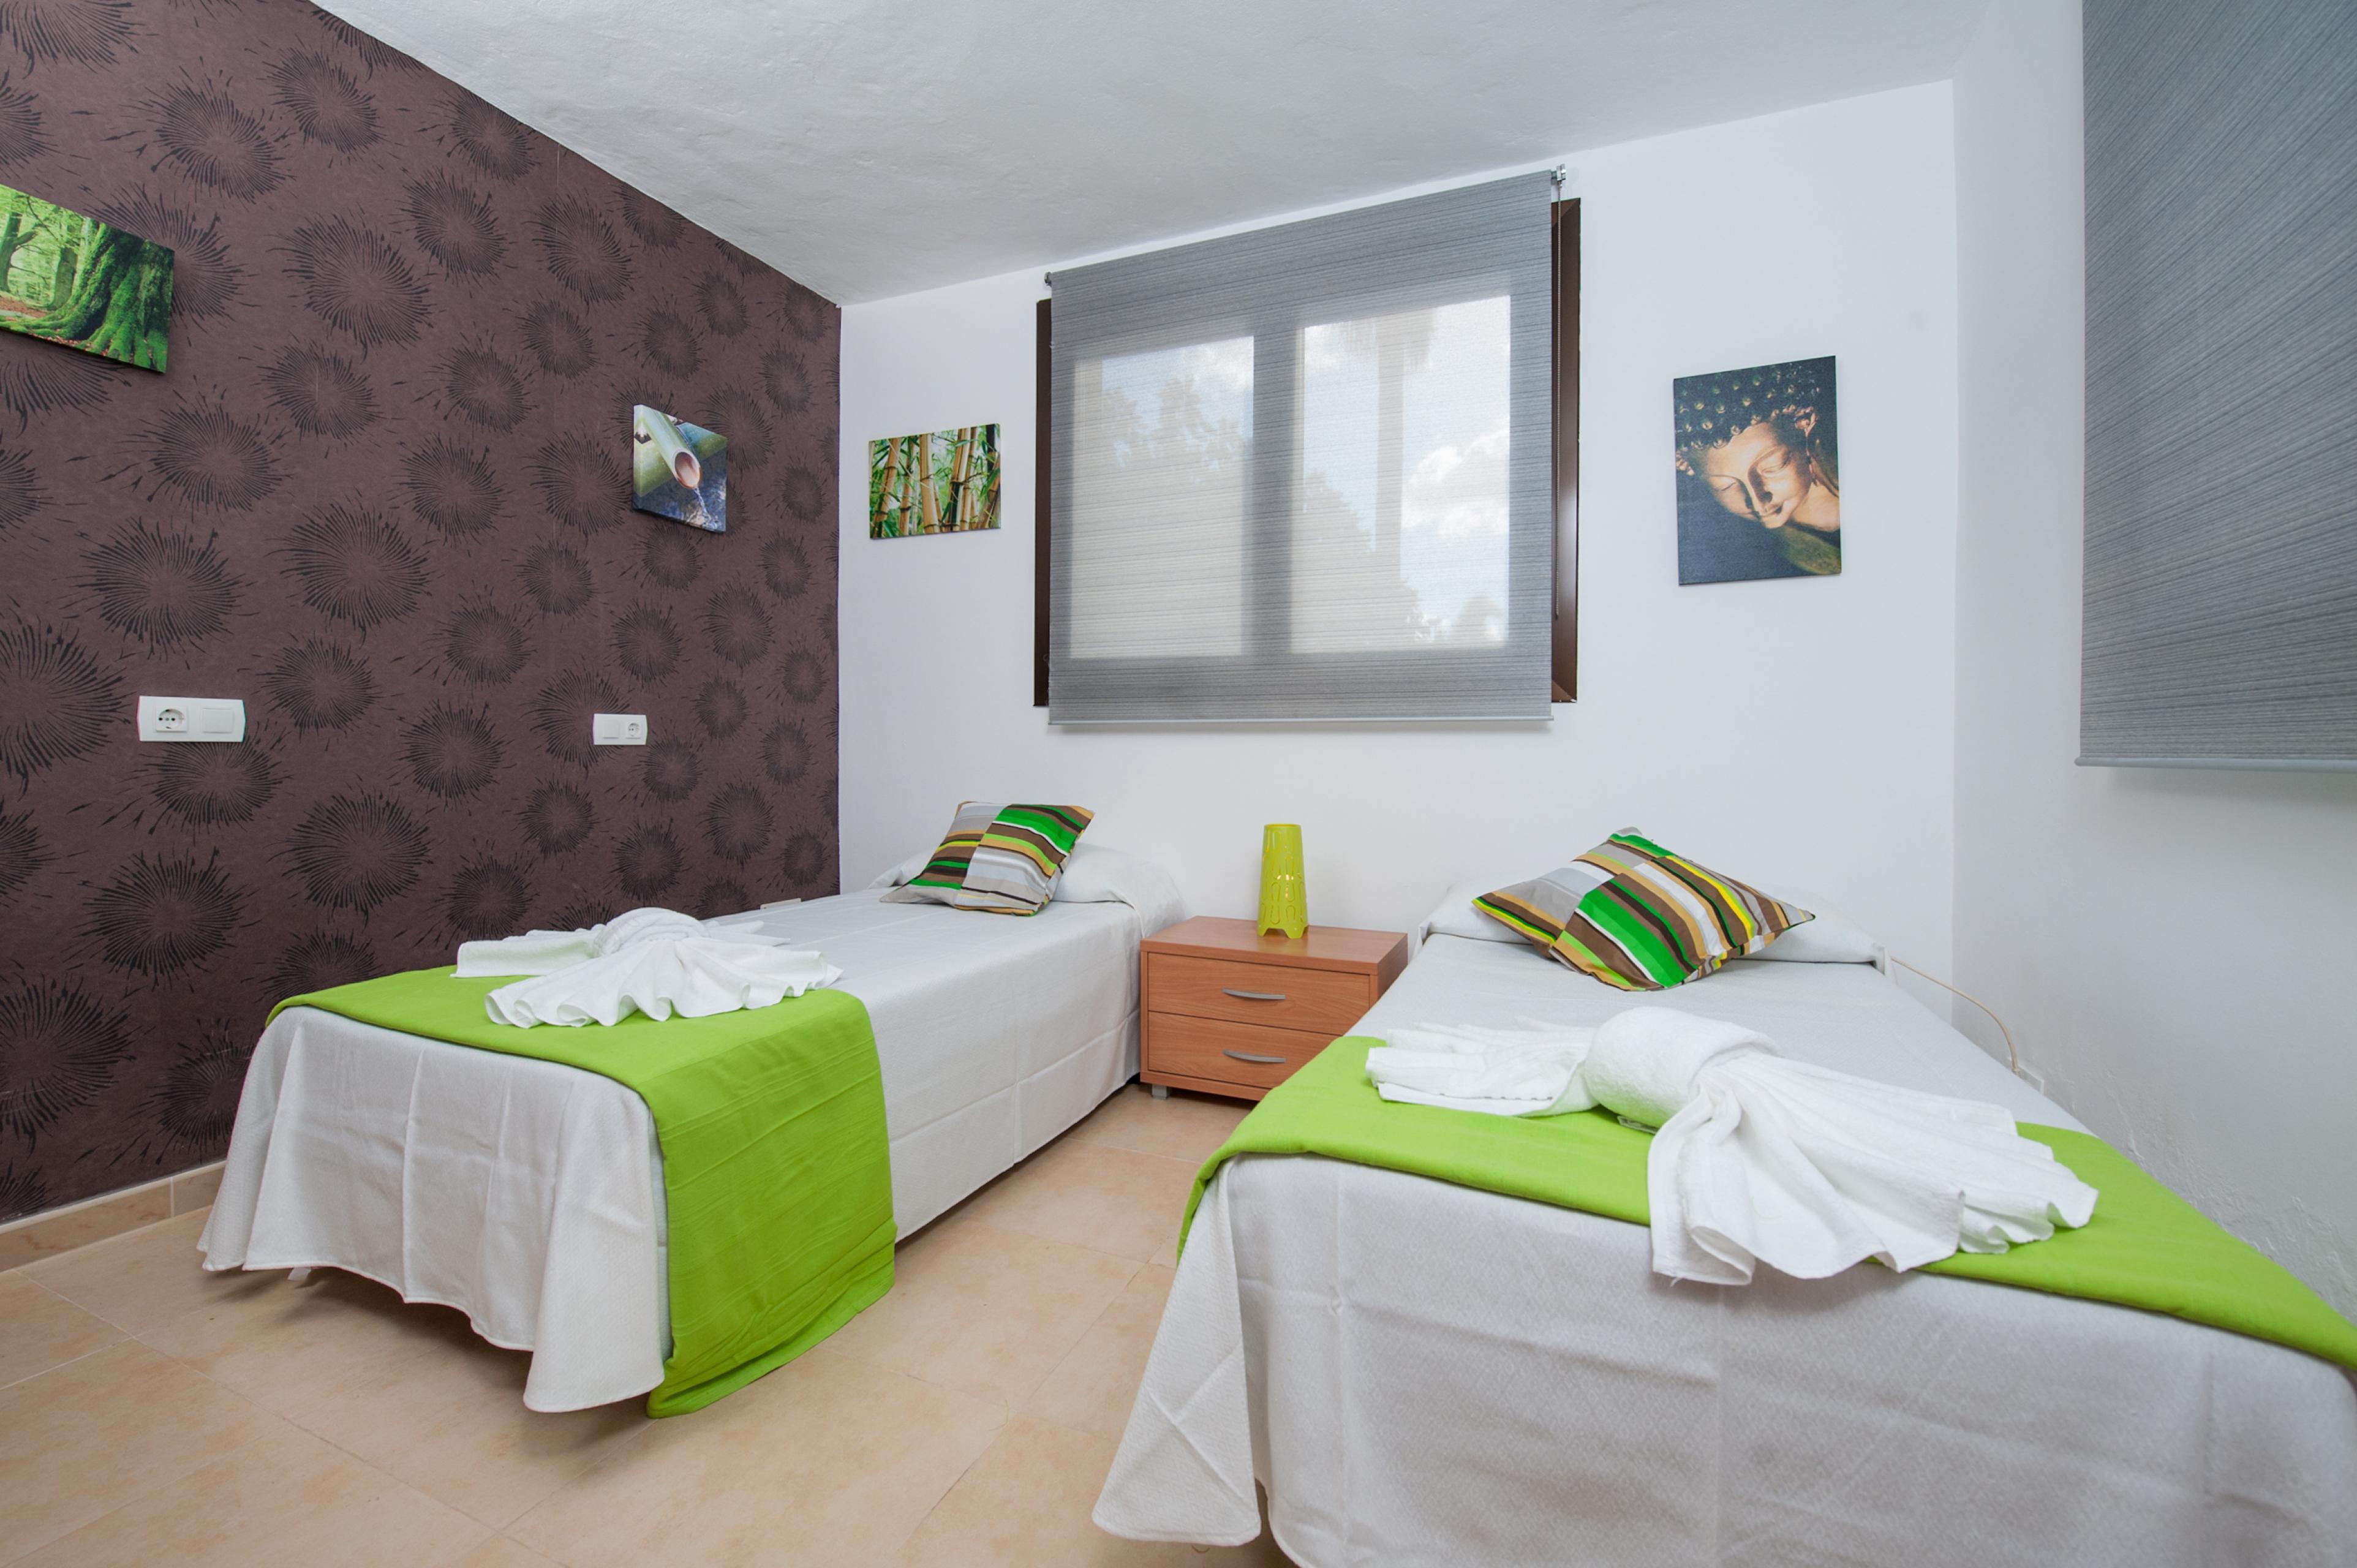 Maison de vacances CA'N LLUC- Alaró- MALLORCA - Kostenloses WLAN (2687507), Alaro, Majorque, Iles Baléares, Espagne, image 34